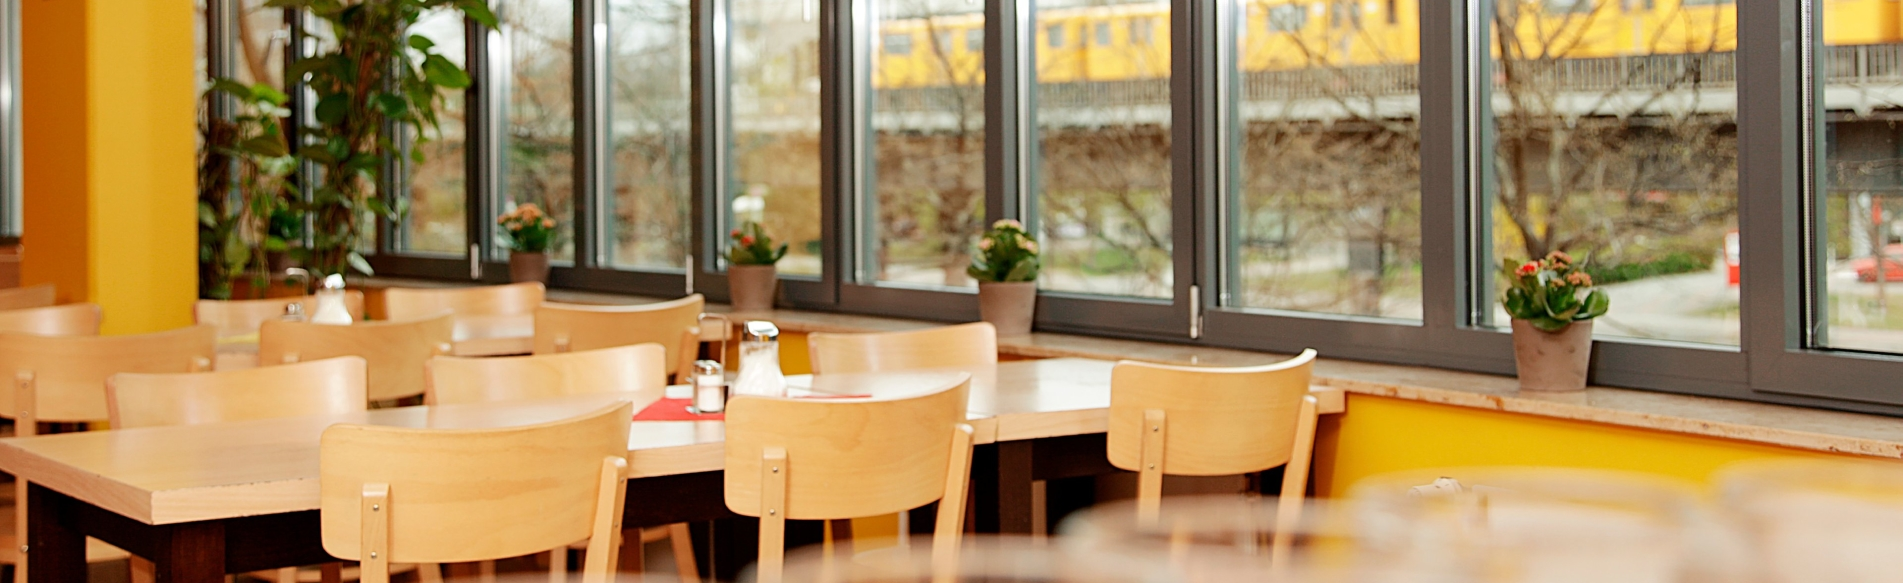 Kreuzberg Hostel Frühstück